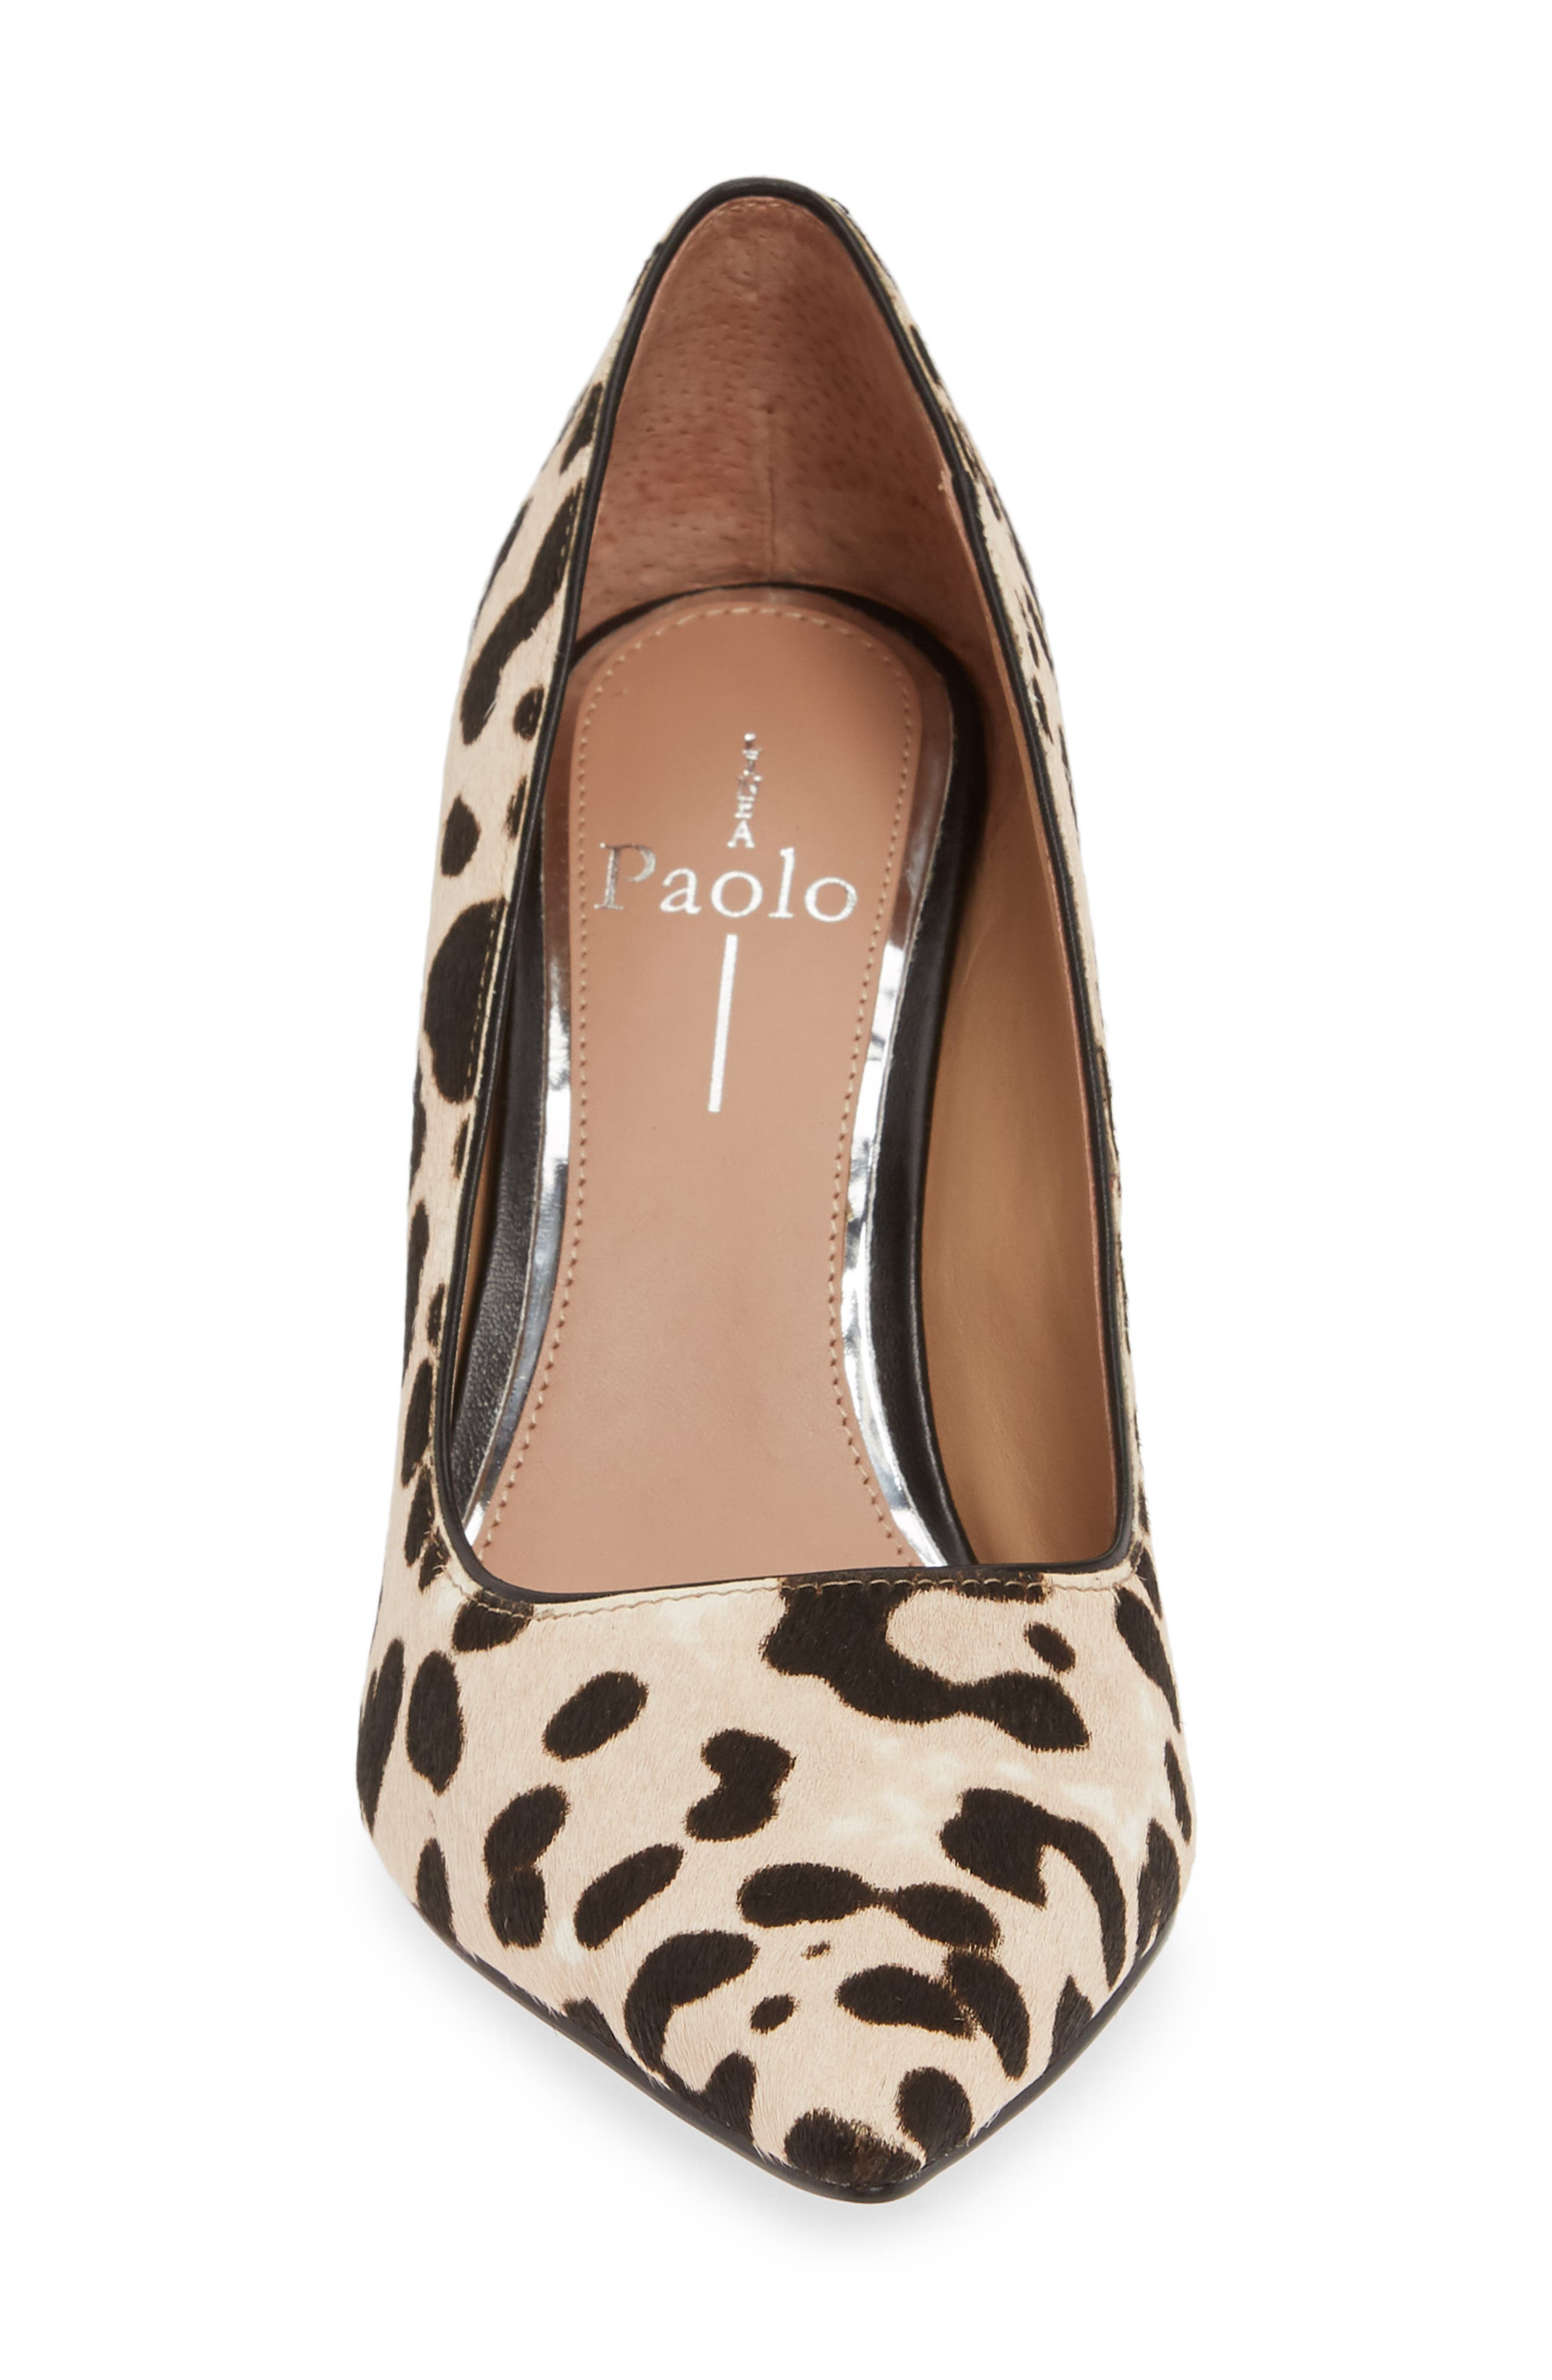 LINEA PAOLO, Payton Genuine Calf Hair Pointy Toe Pump, Alternate thumbnail 4, color, WHITE/ BLACK CALF HAIR